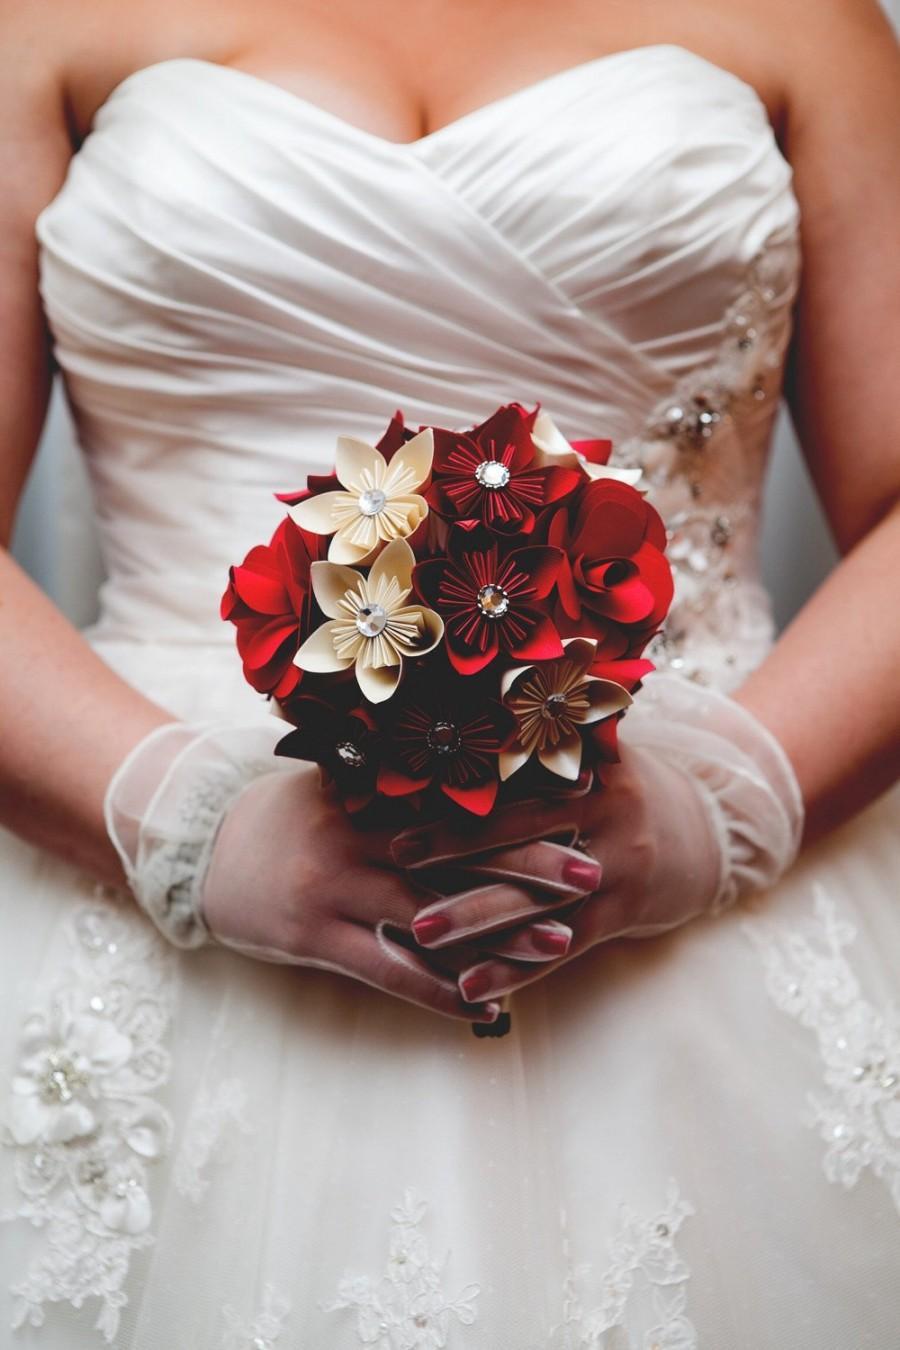 Свадьба - Paper rose and kusudama wedding bouquet, red rose bouquet, kusudama bouquet, bridal bouquet, faux flower bouquet, paper bouquet, elegant